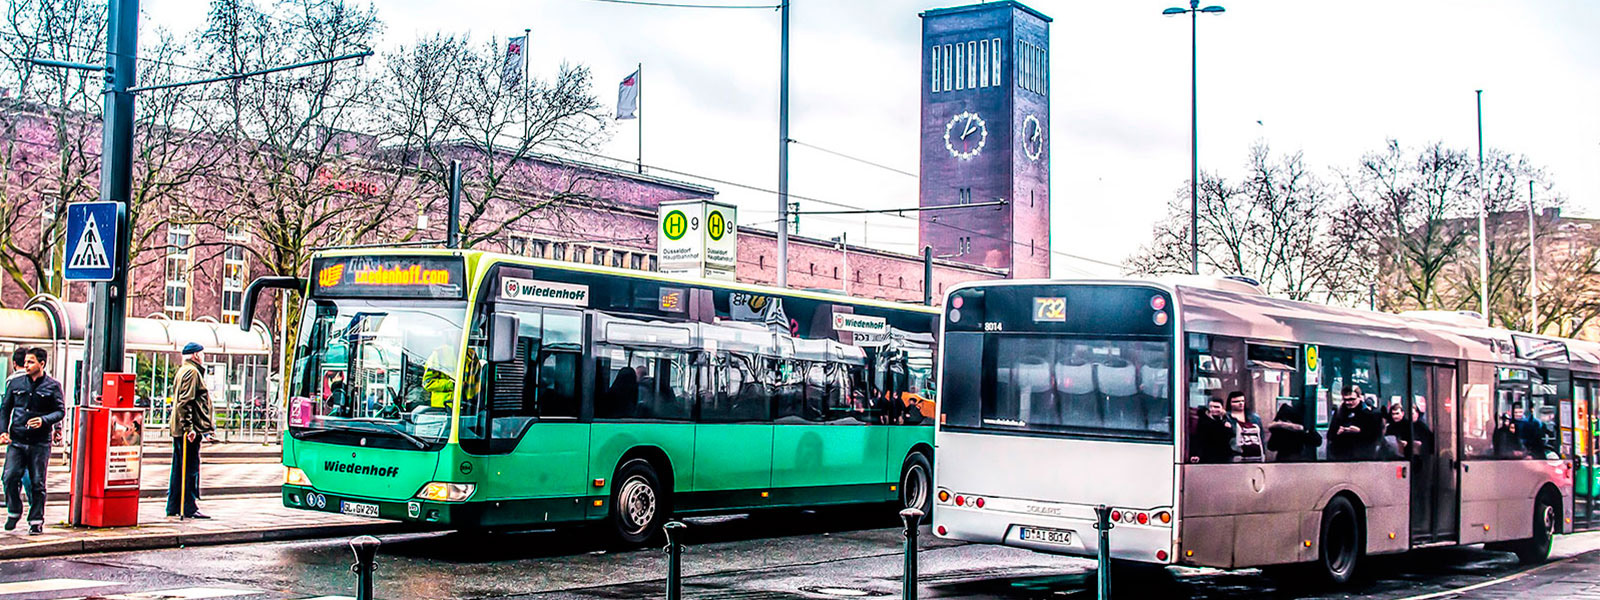 duesseldorf-Verkehrsmittelwerbung-bus-werbung